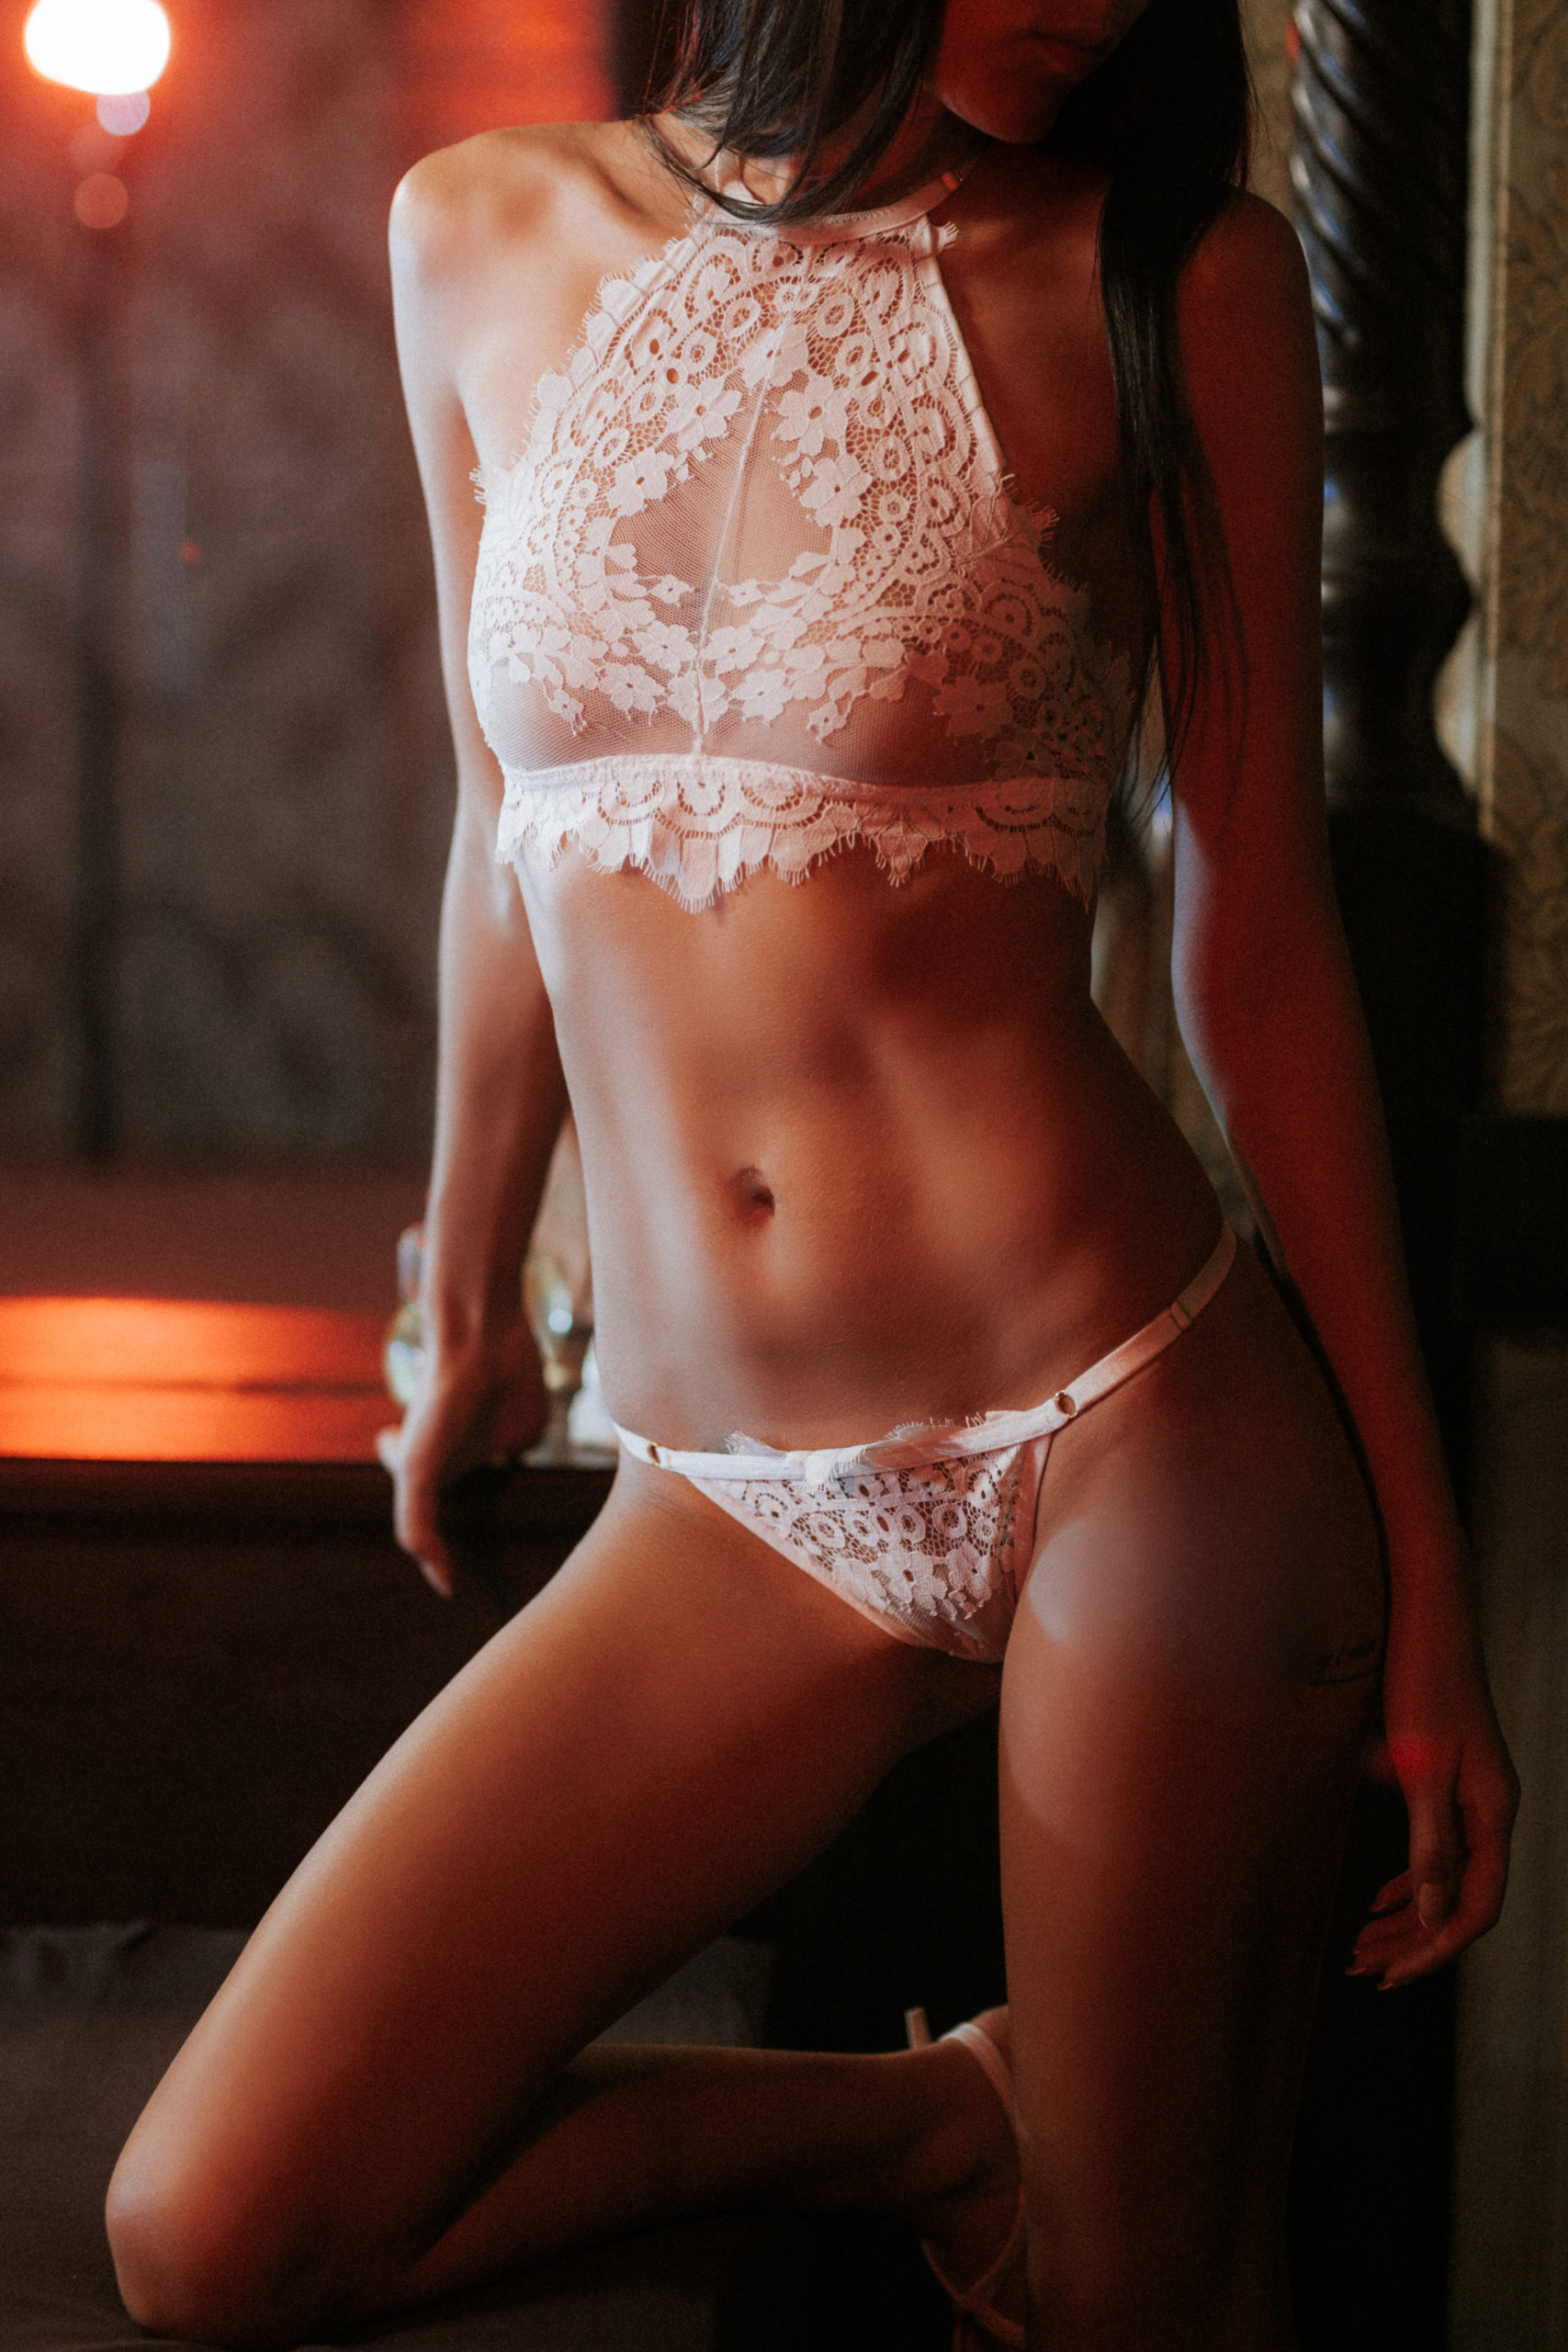 IMG 5726 1 scaled - Расписание мастеров салона эротического массажа Premier Spa